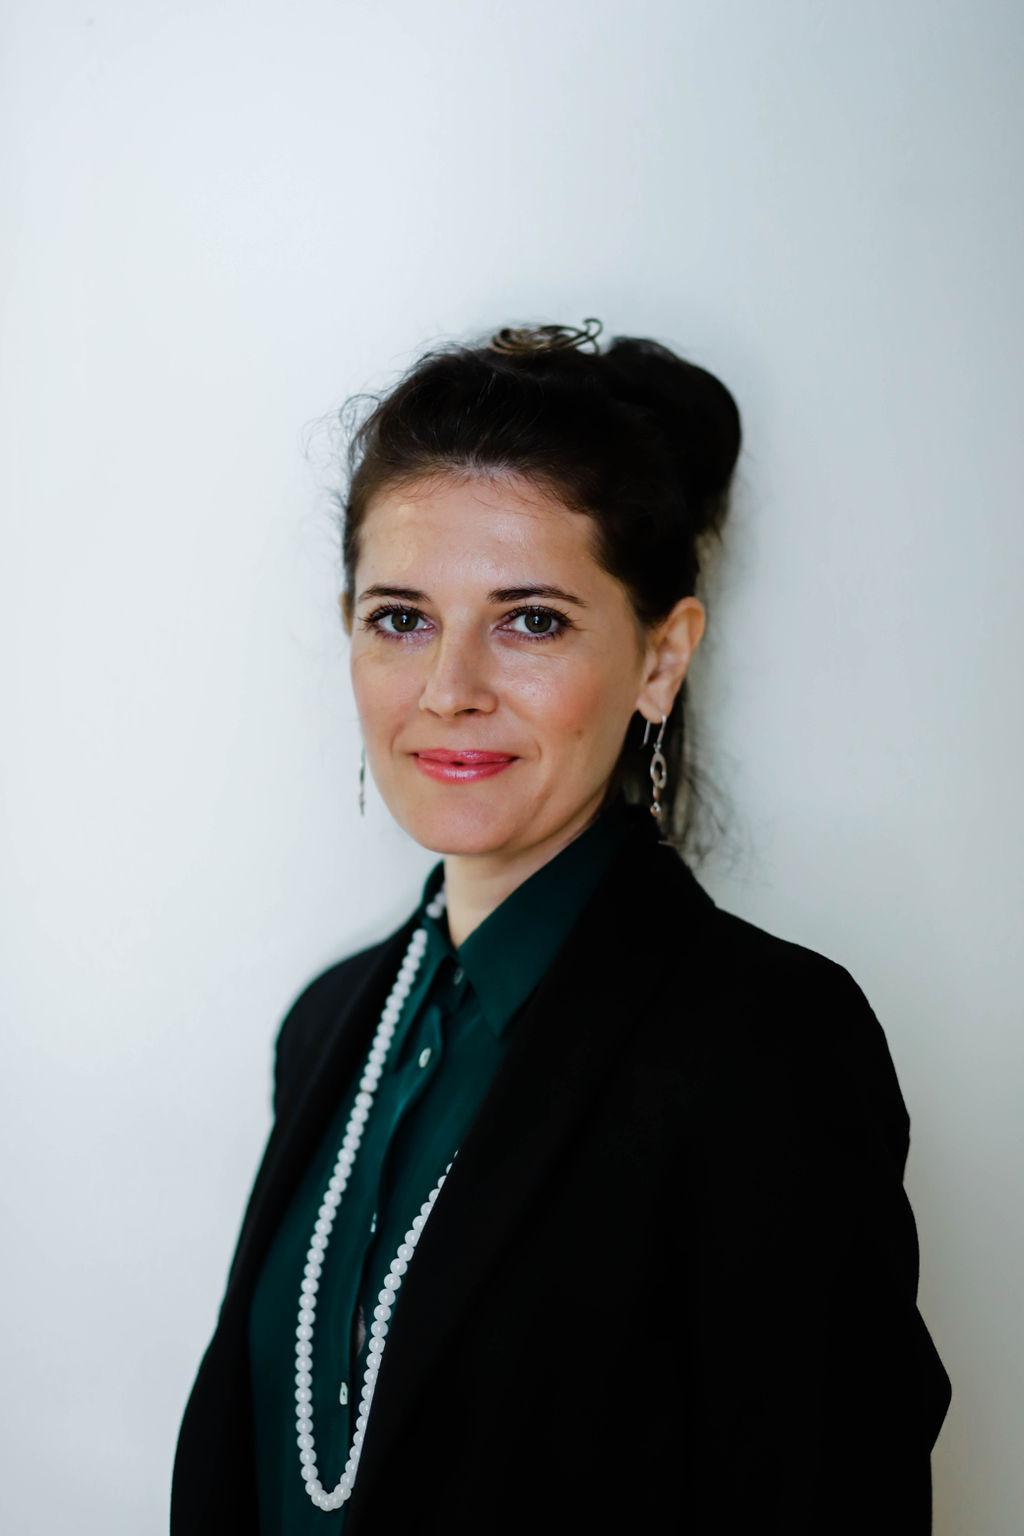 Marianna Silanteva RMT